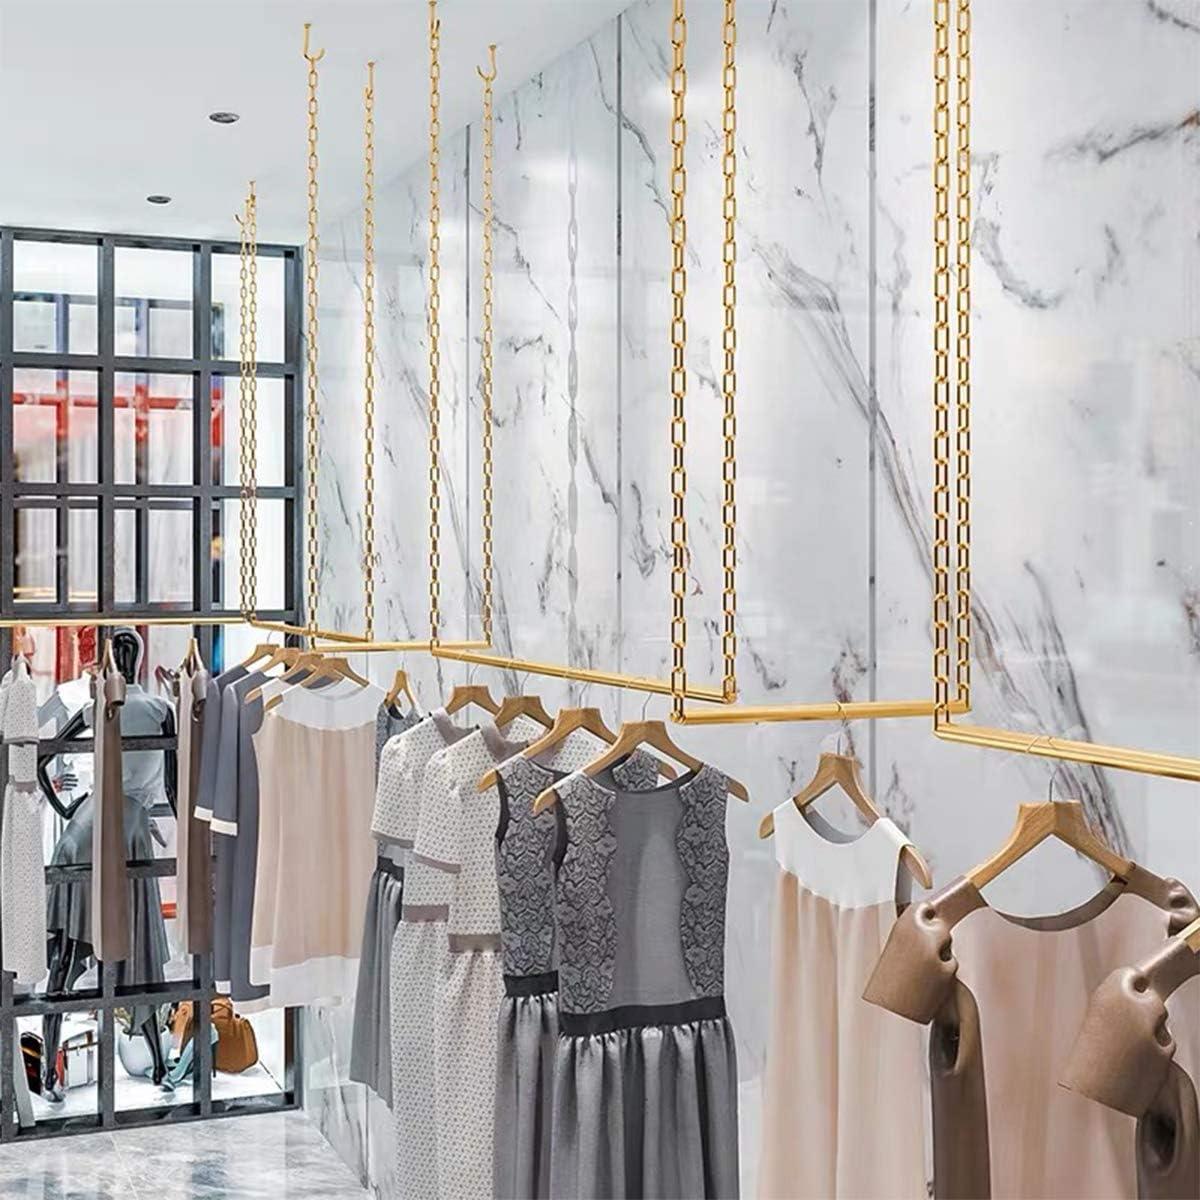 Gold Round Tube, 24 L FURVOKIA 2 Pcs Adjustable Height Creative Iron Chain Clothing Hanging Racks,Clothes Storage Shelves Heavy Duty Metal Garment Rack,Retail Display Ceiling Hanger